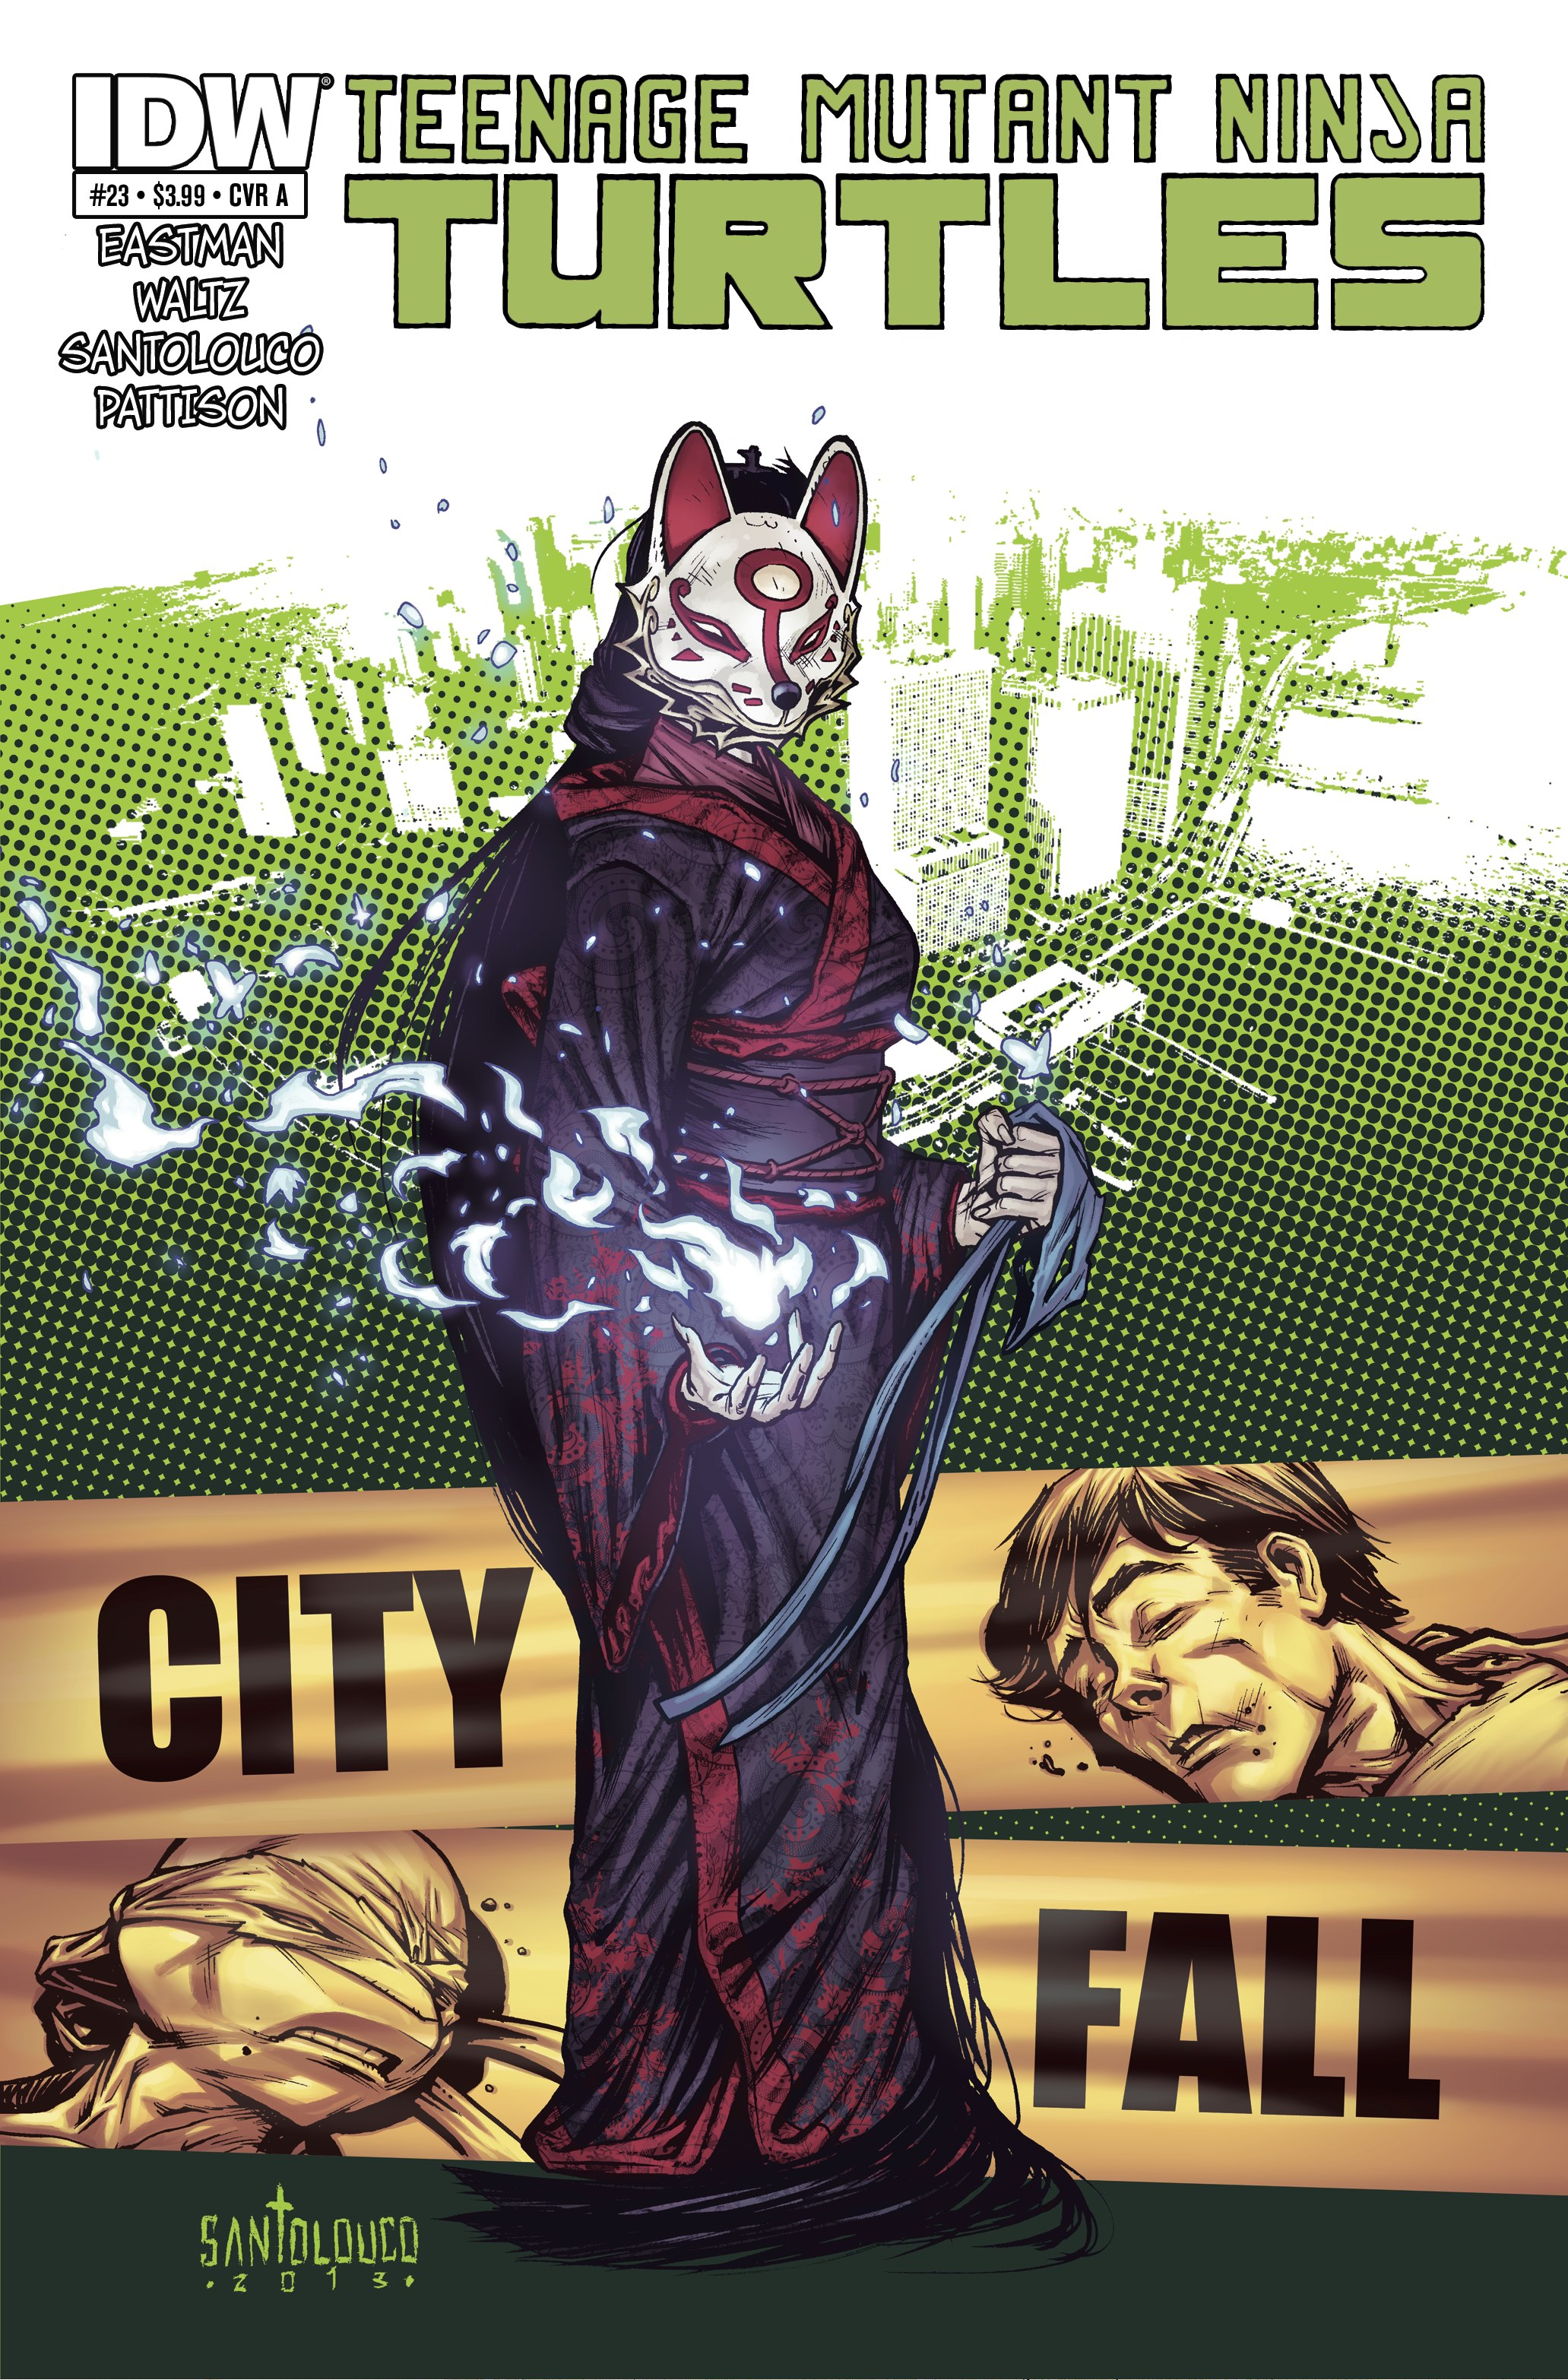 City Fall, part 2